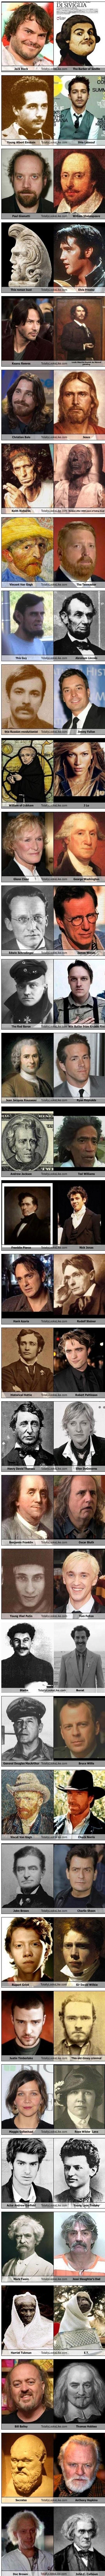 Historical celebrity look-alikes. Whoa!